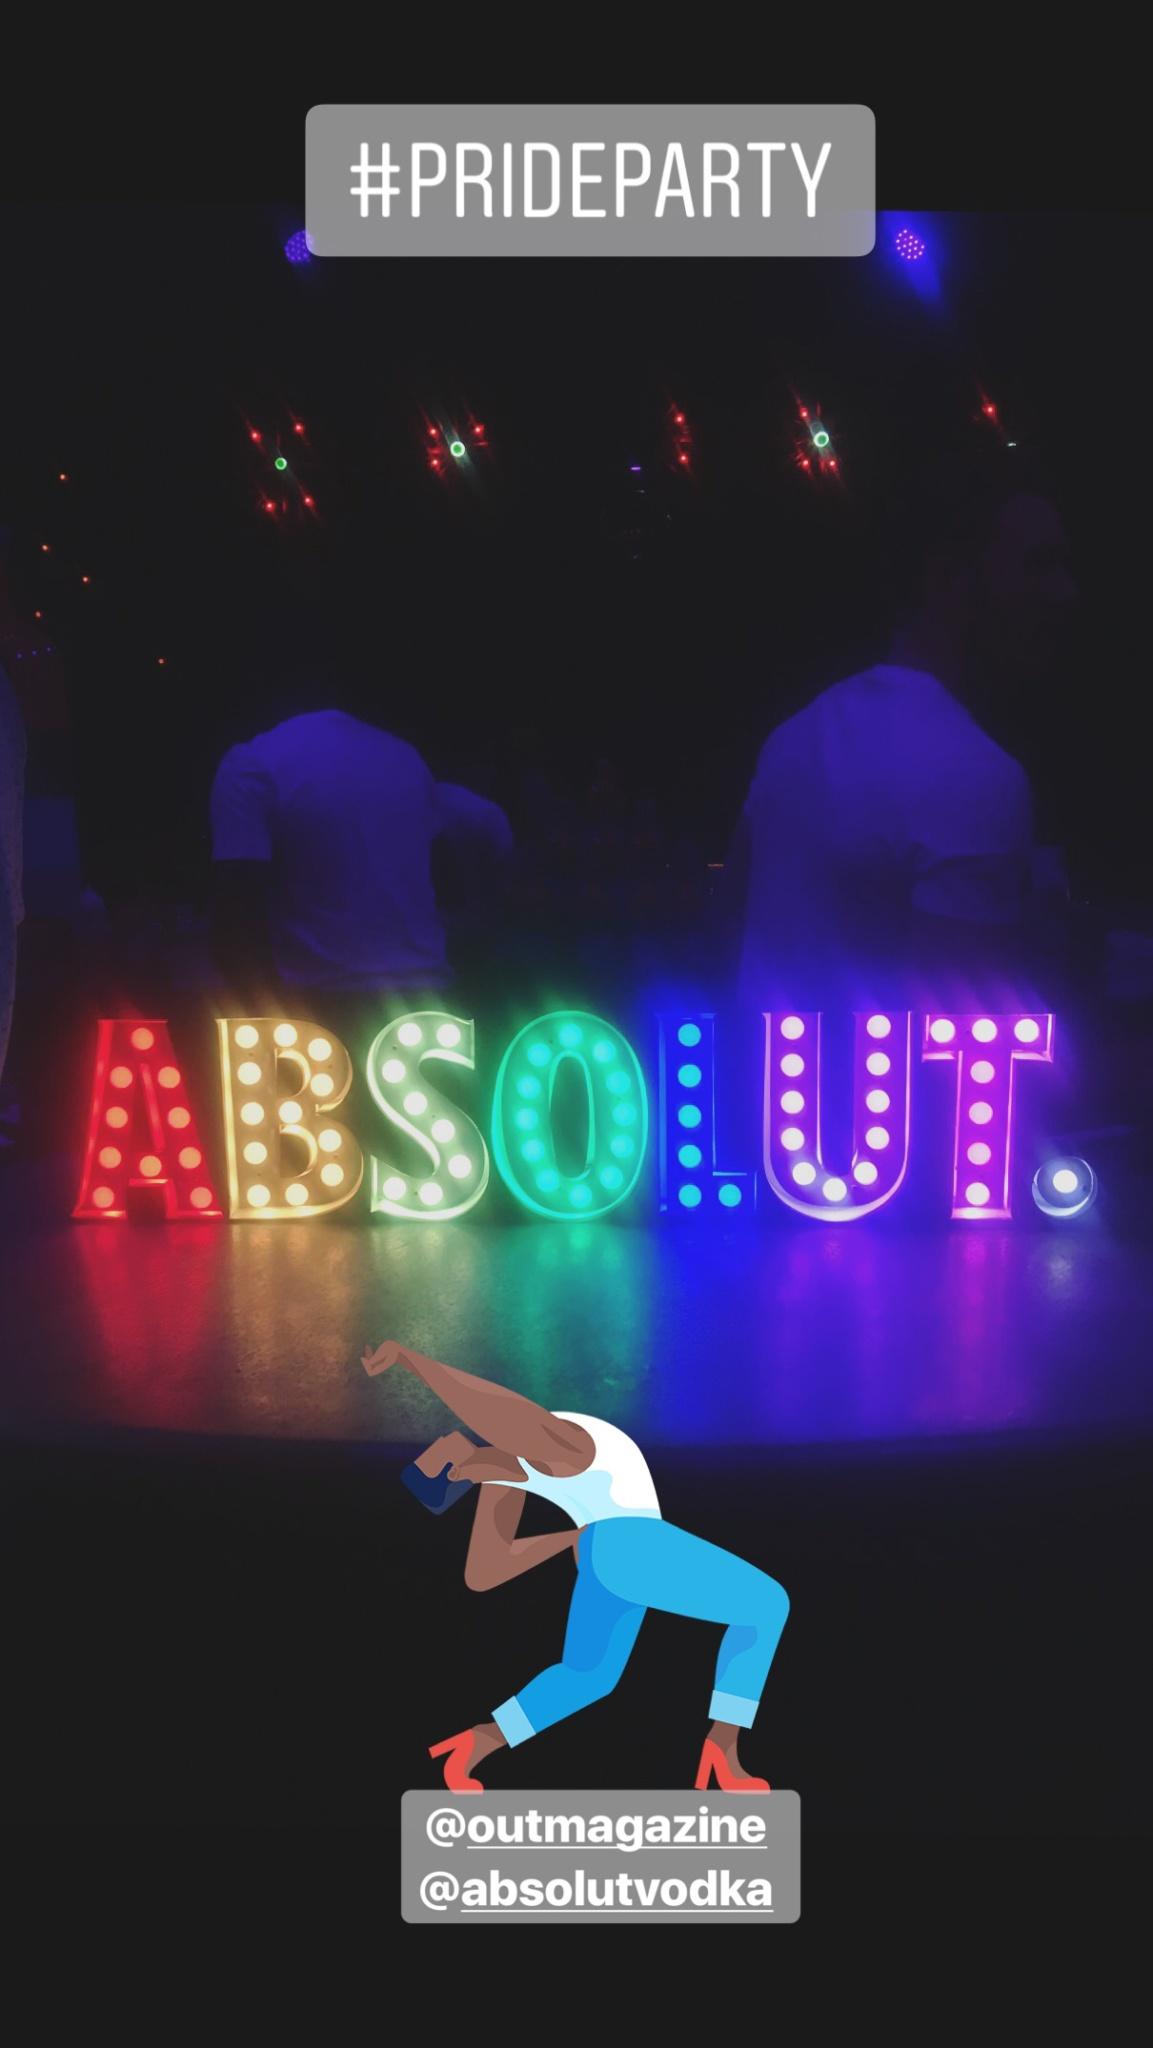 NYC Pride 2017 - Hoppr by Absolut Vodka - OUT Magazine - Diamond Horseshoe - Gay Pride - Out & Proud - Steven Killian - TheKillerLook.com - The Killer Look - TheKillerLook